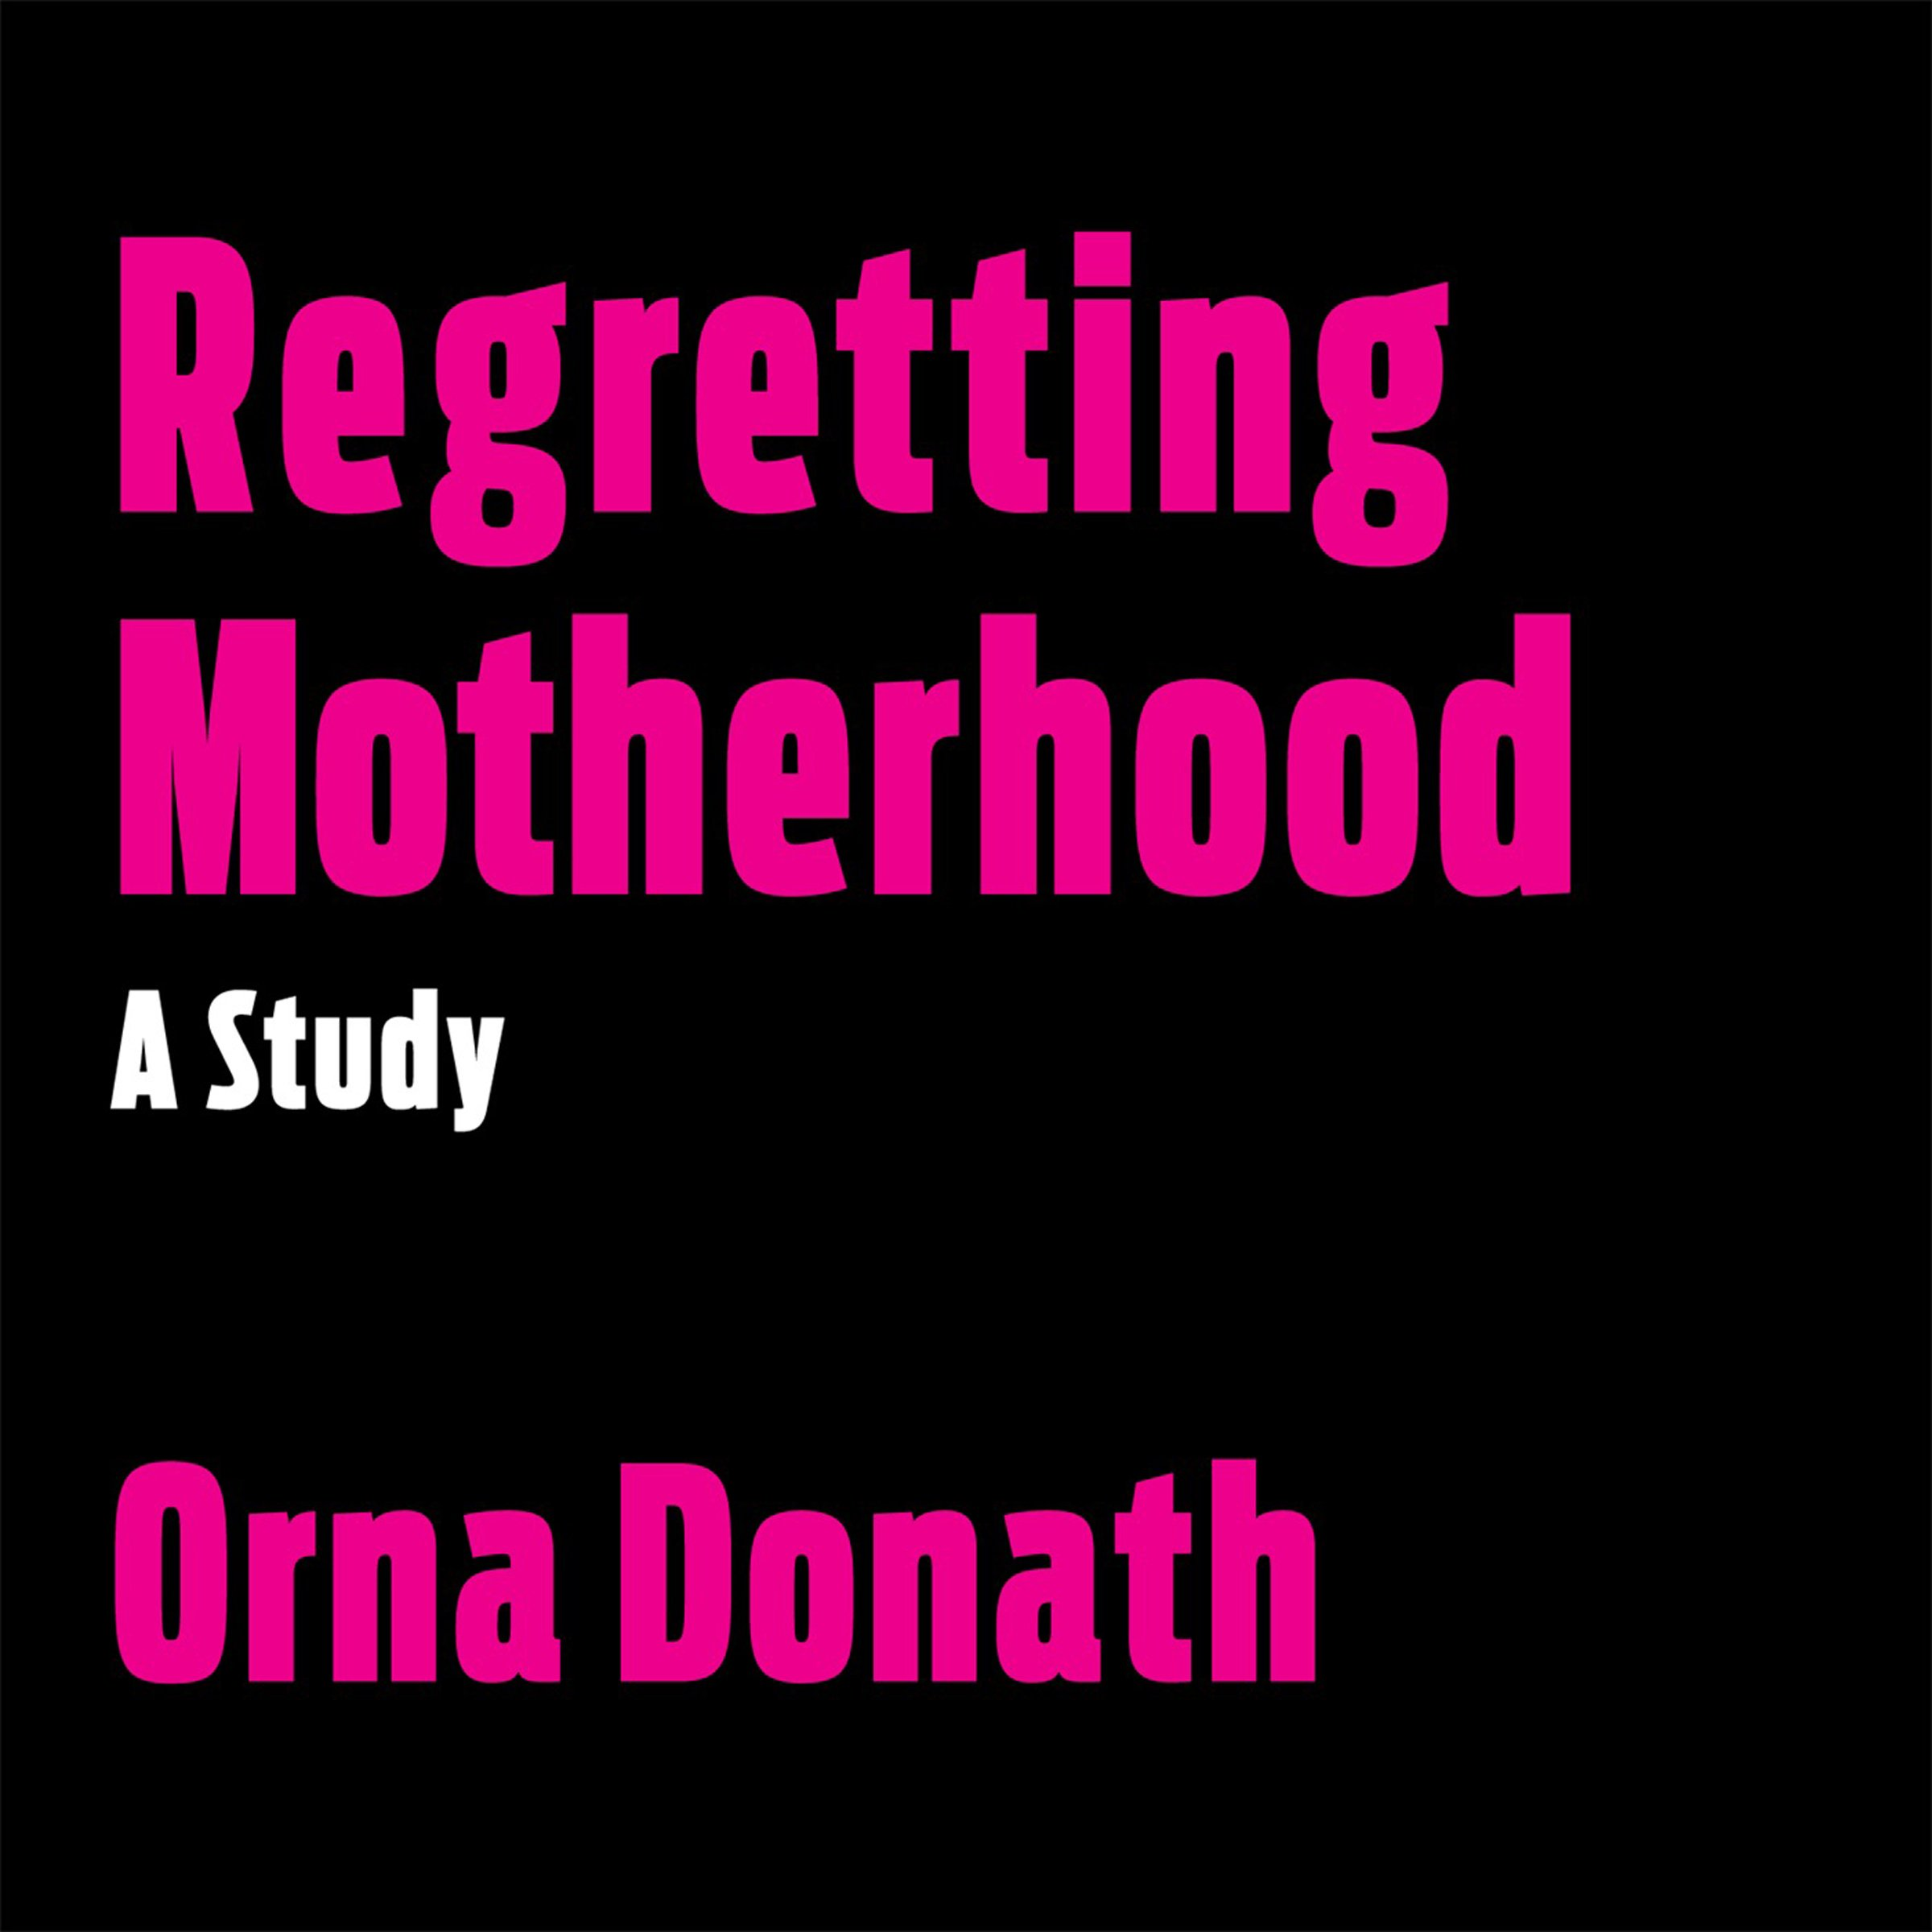 Regretting Motherhood  A Study